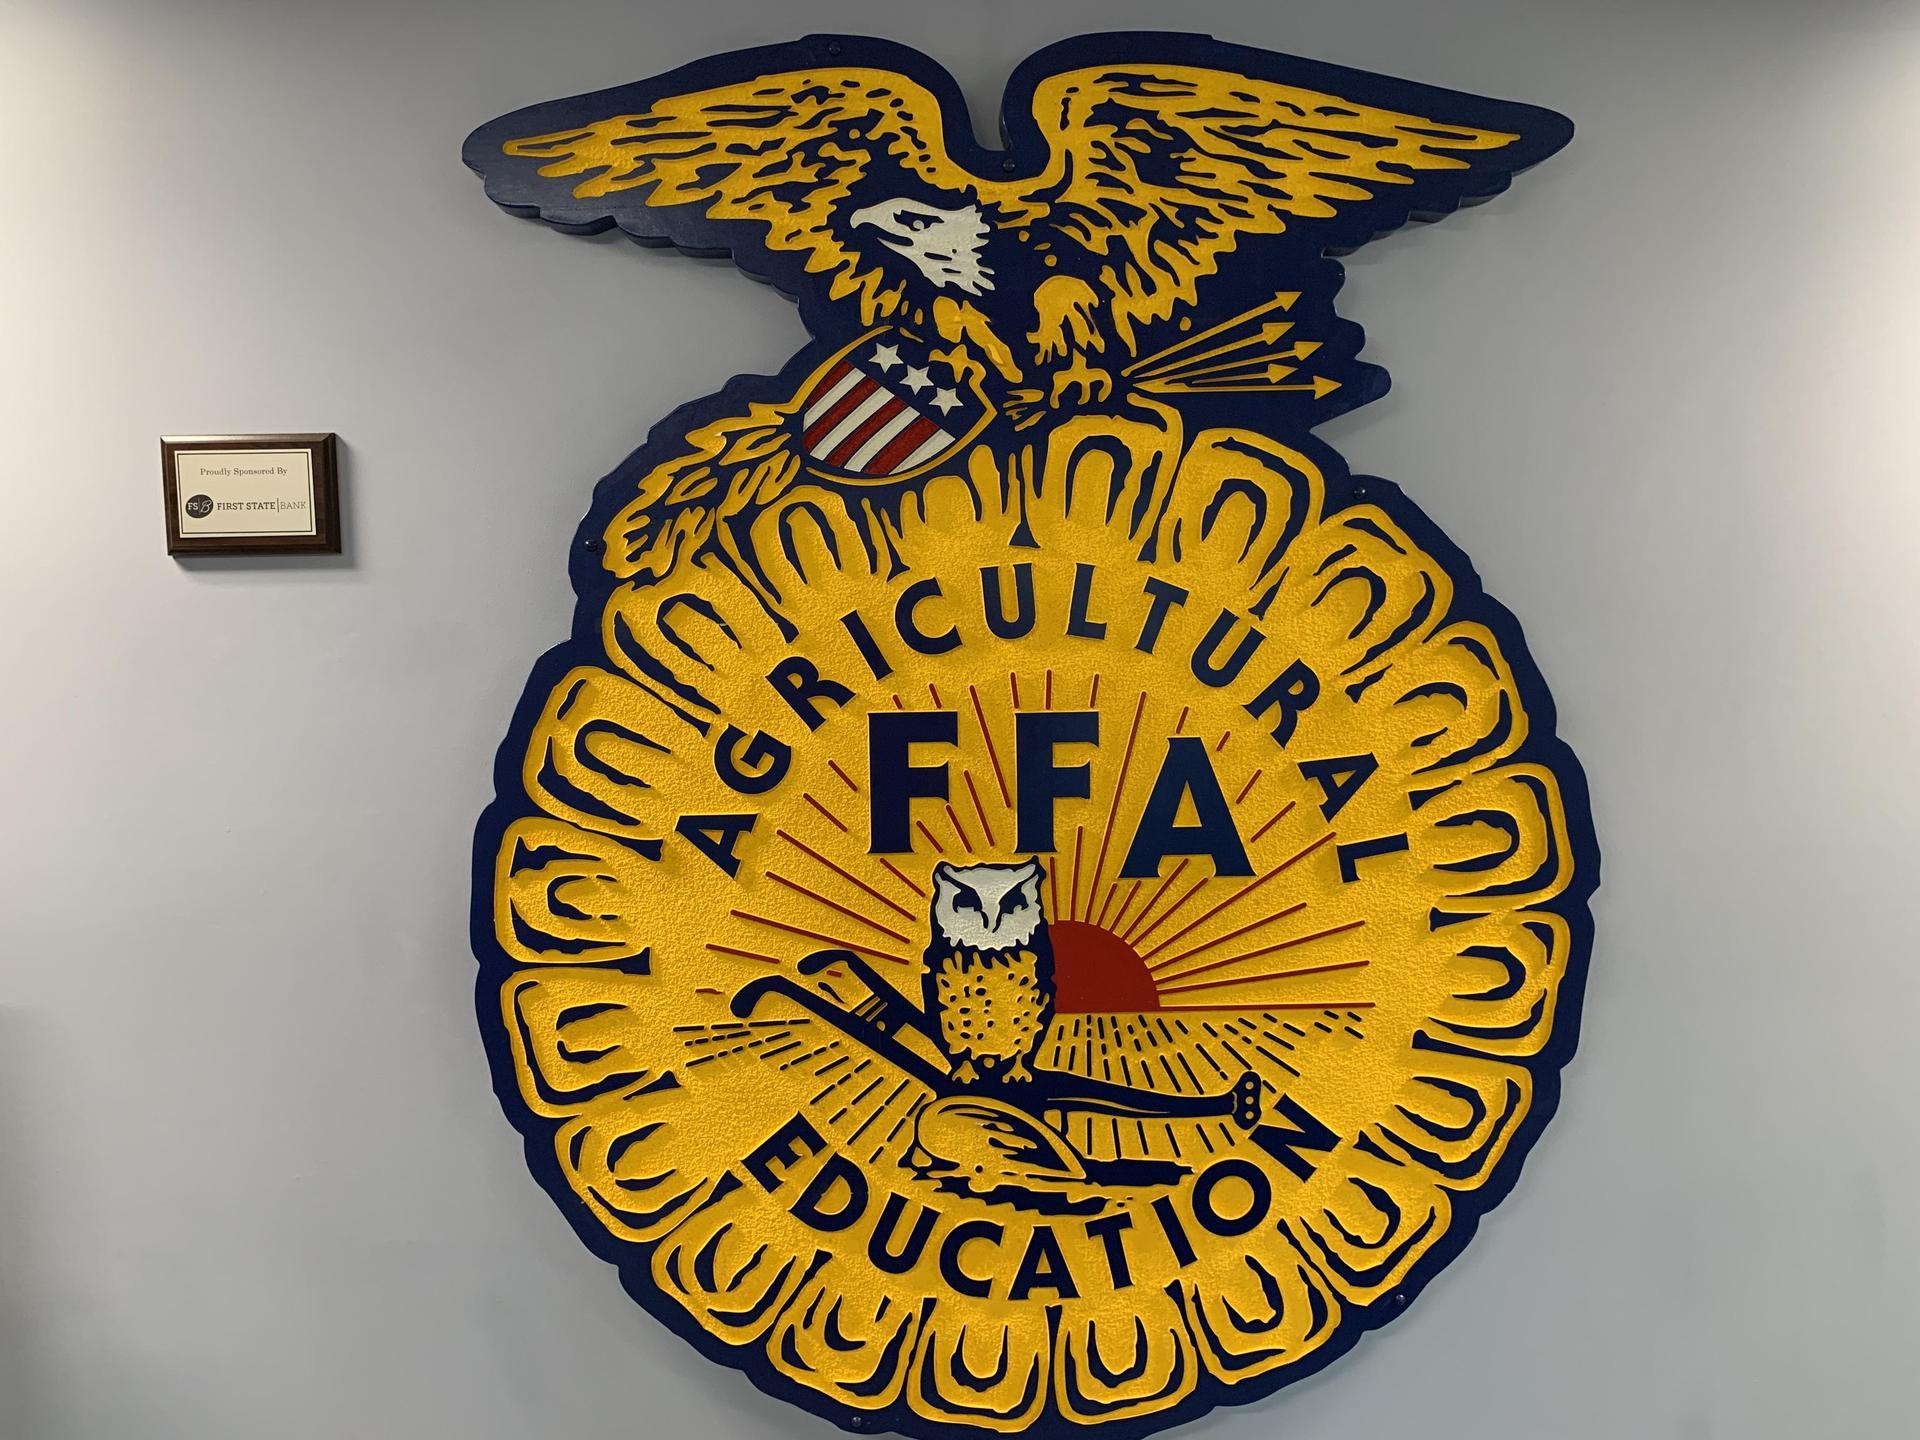 Agricultural Education FFA Seal